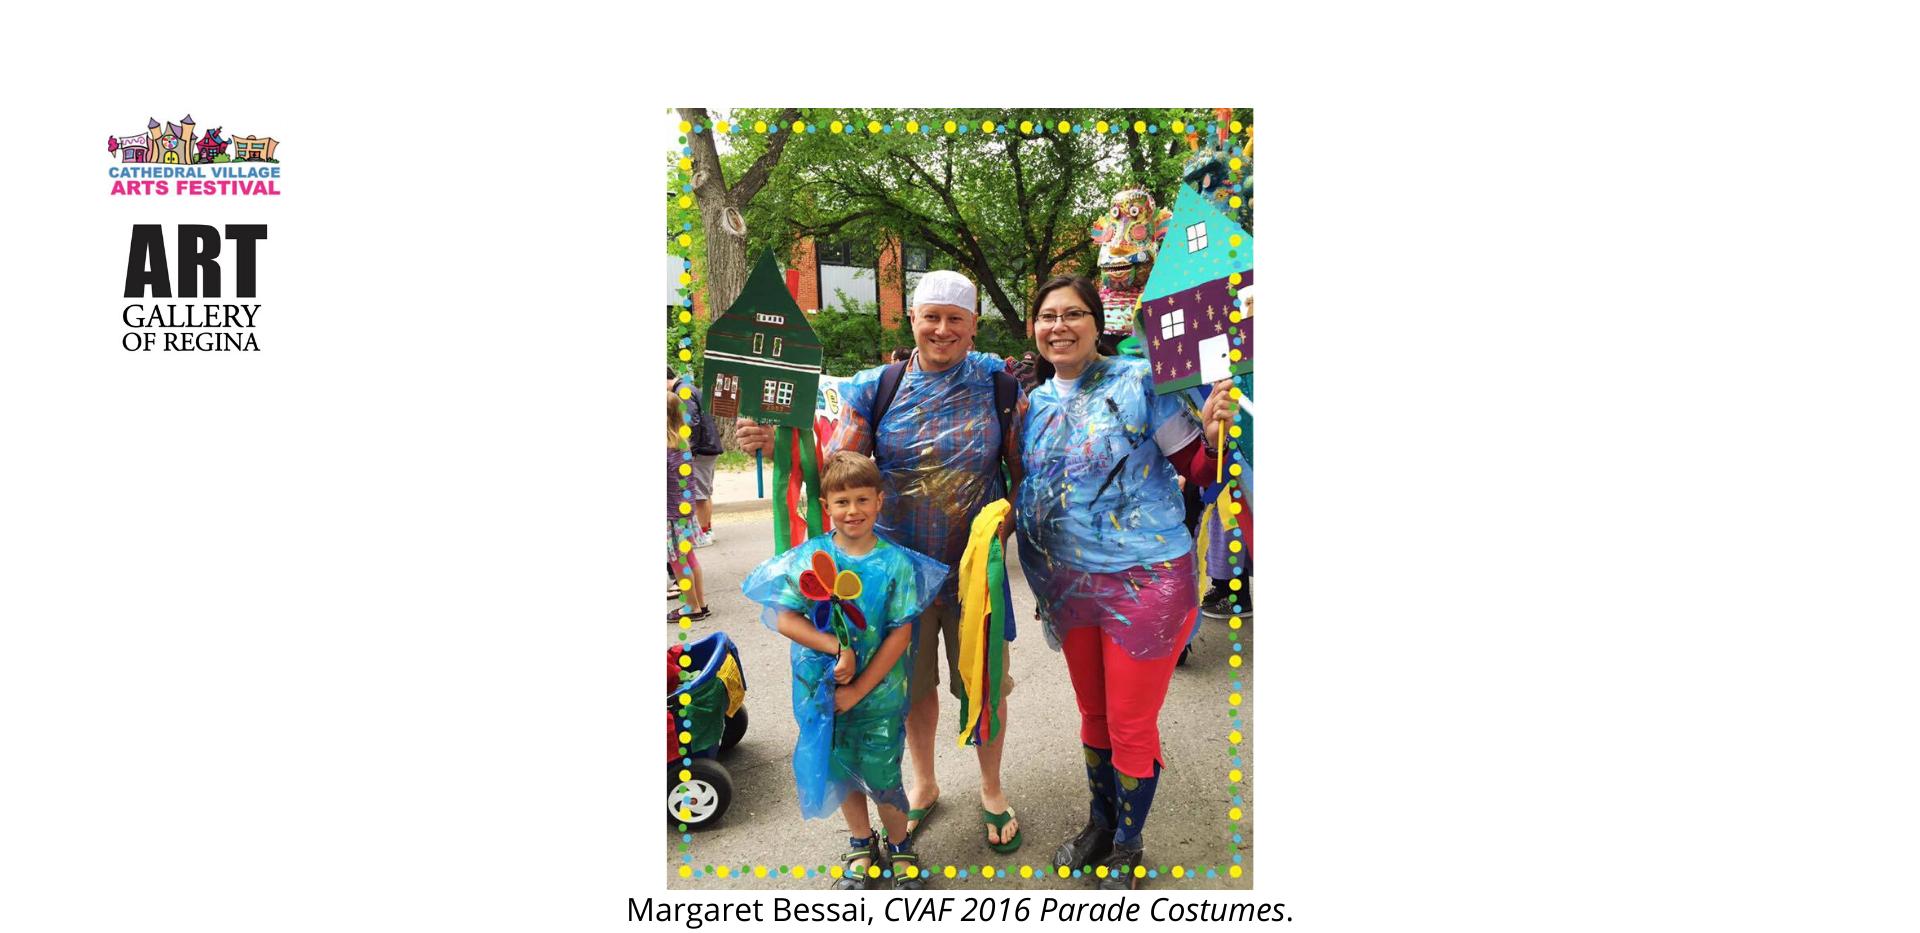 Margaret Bessai,CVAF 2016 Parade Costumes.